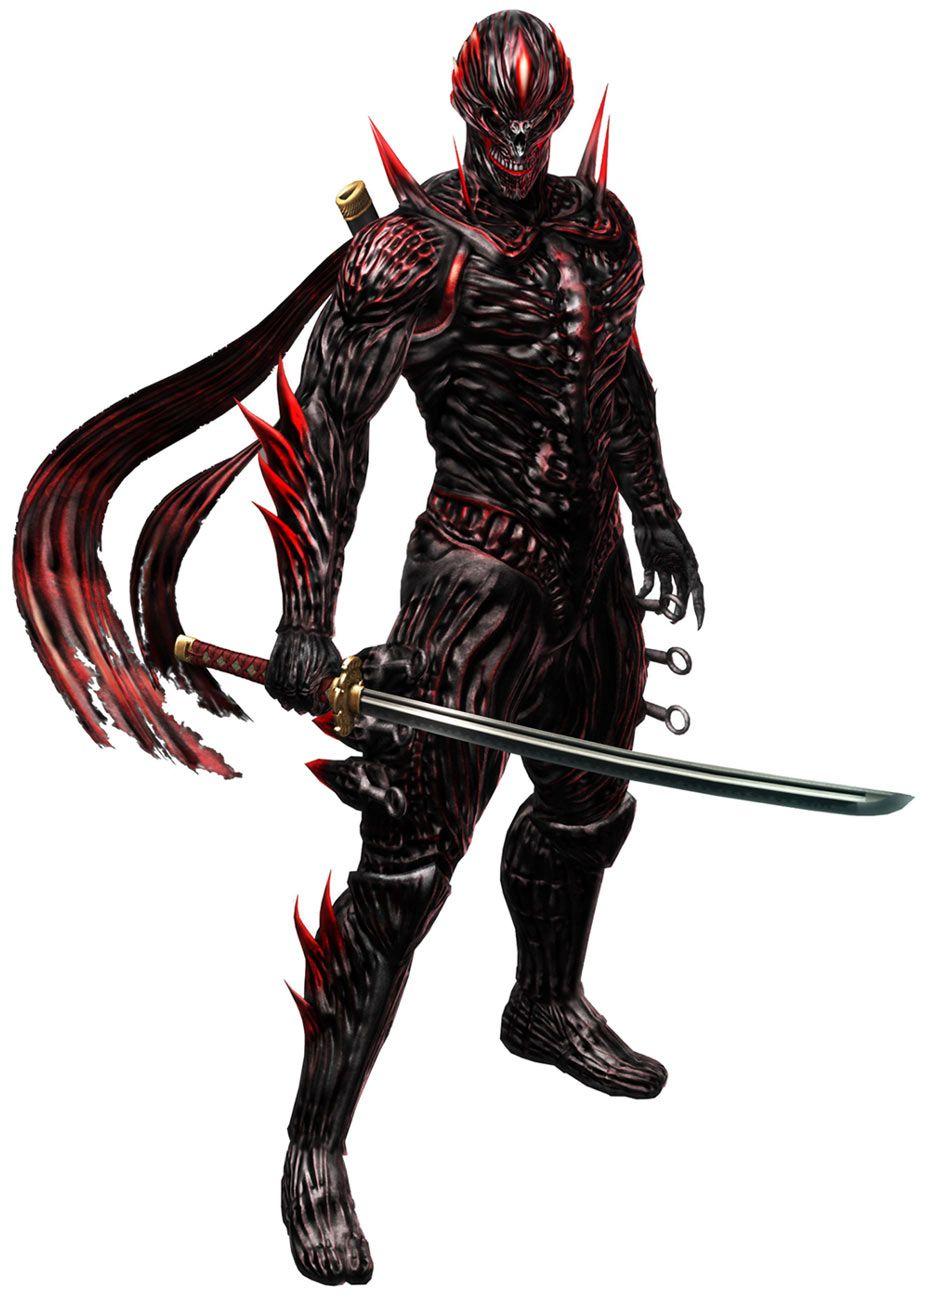 484 Gambar Ninja Gaiden Ninja Game Comic Art Terbaik Ninja